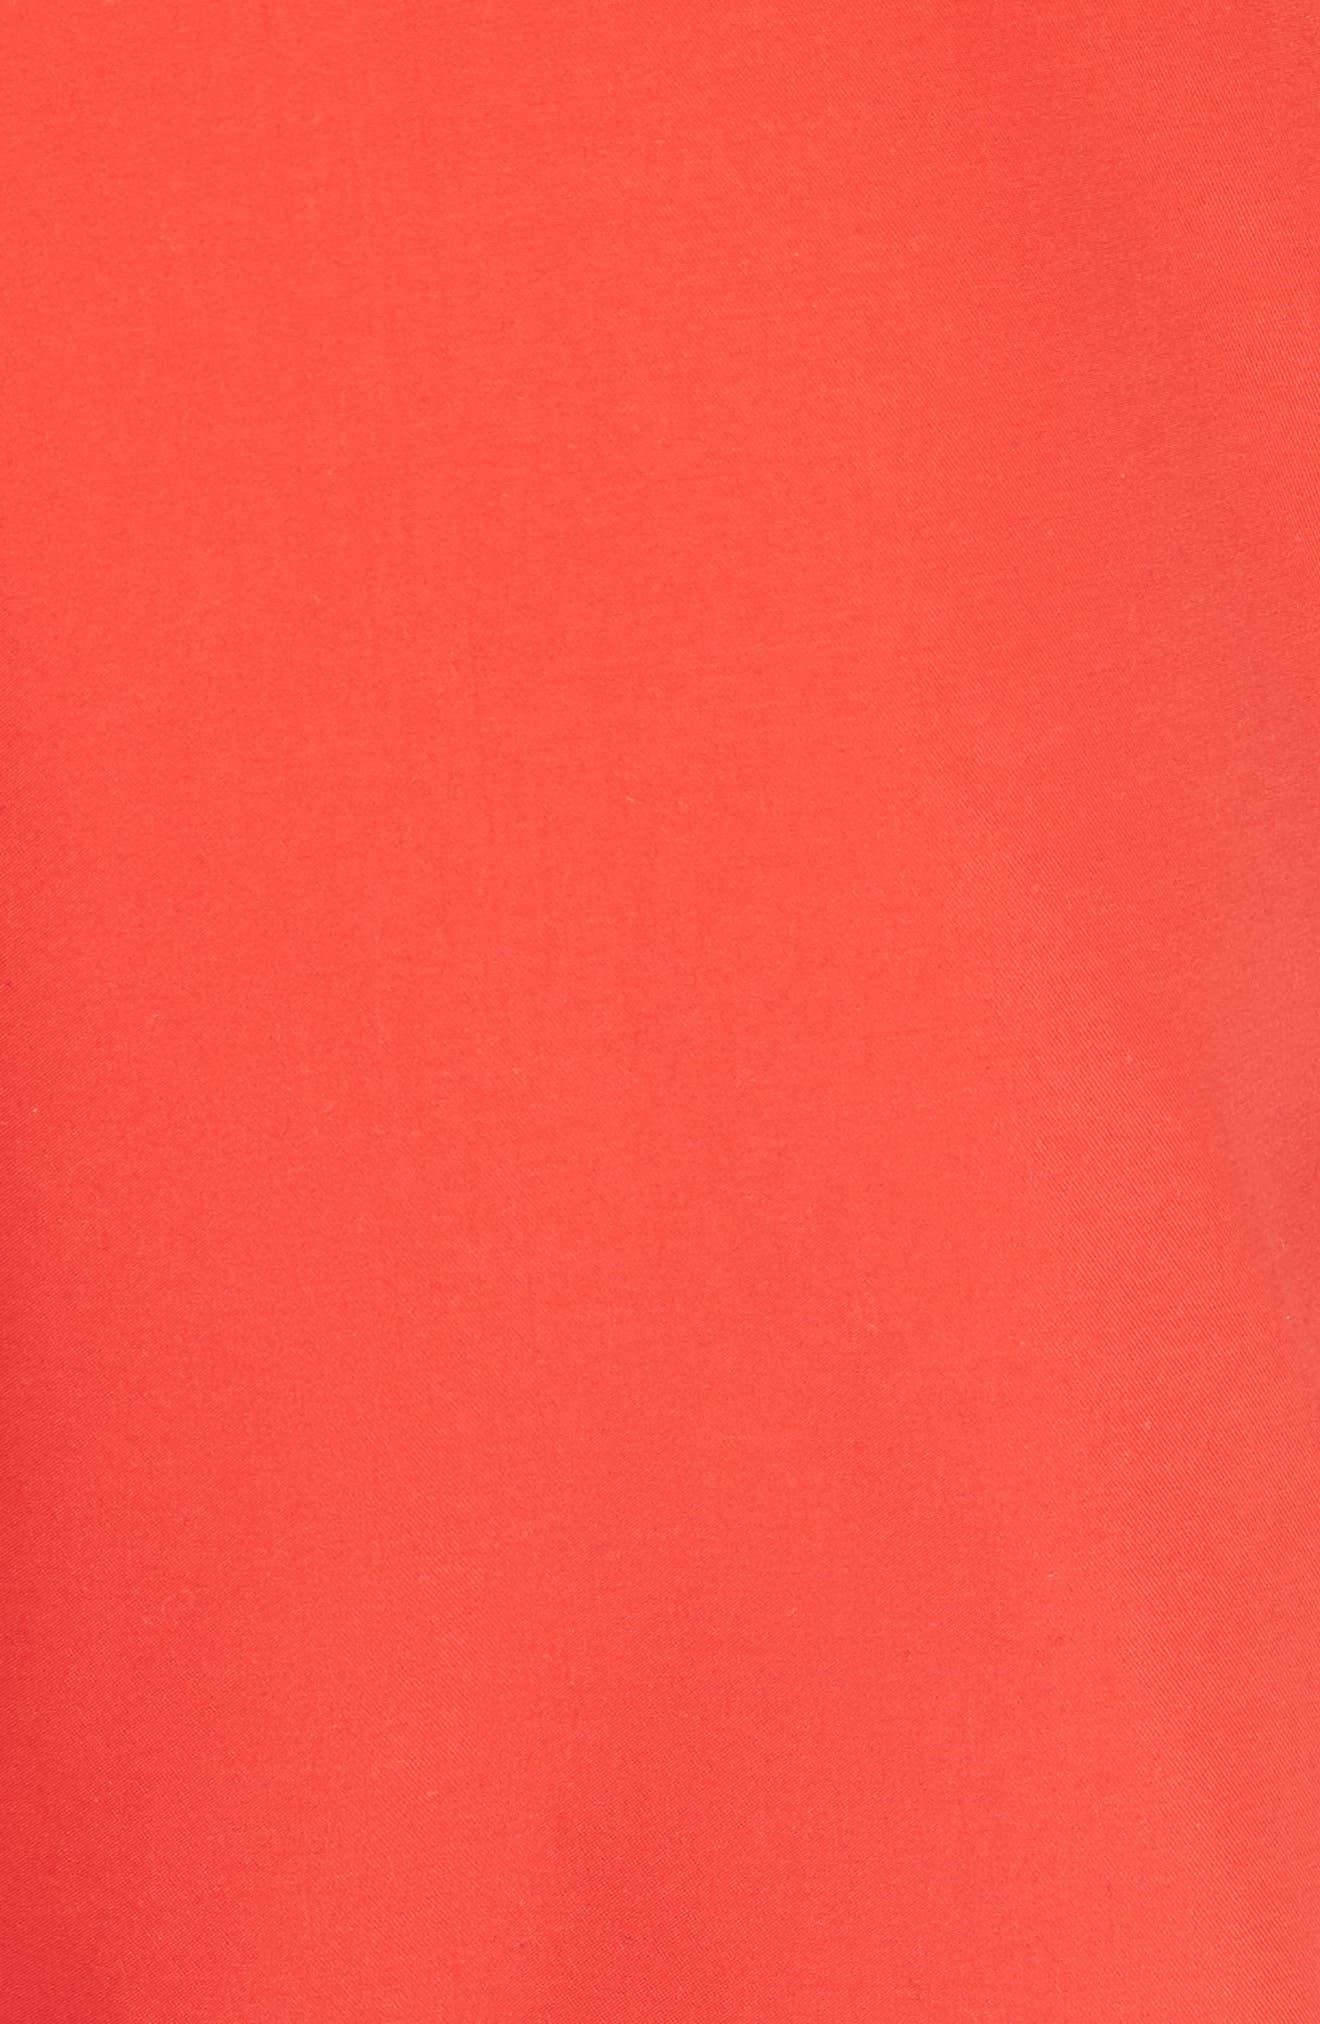 Bermuda Swim Trunks,                             Alternate thumbnail 5, color,                             Red